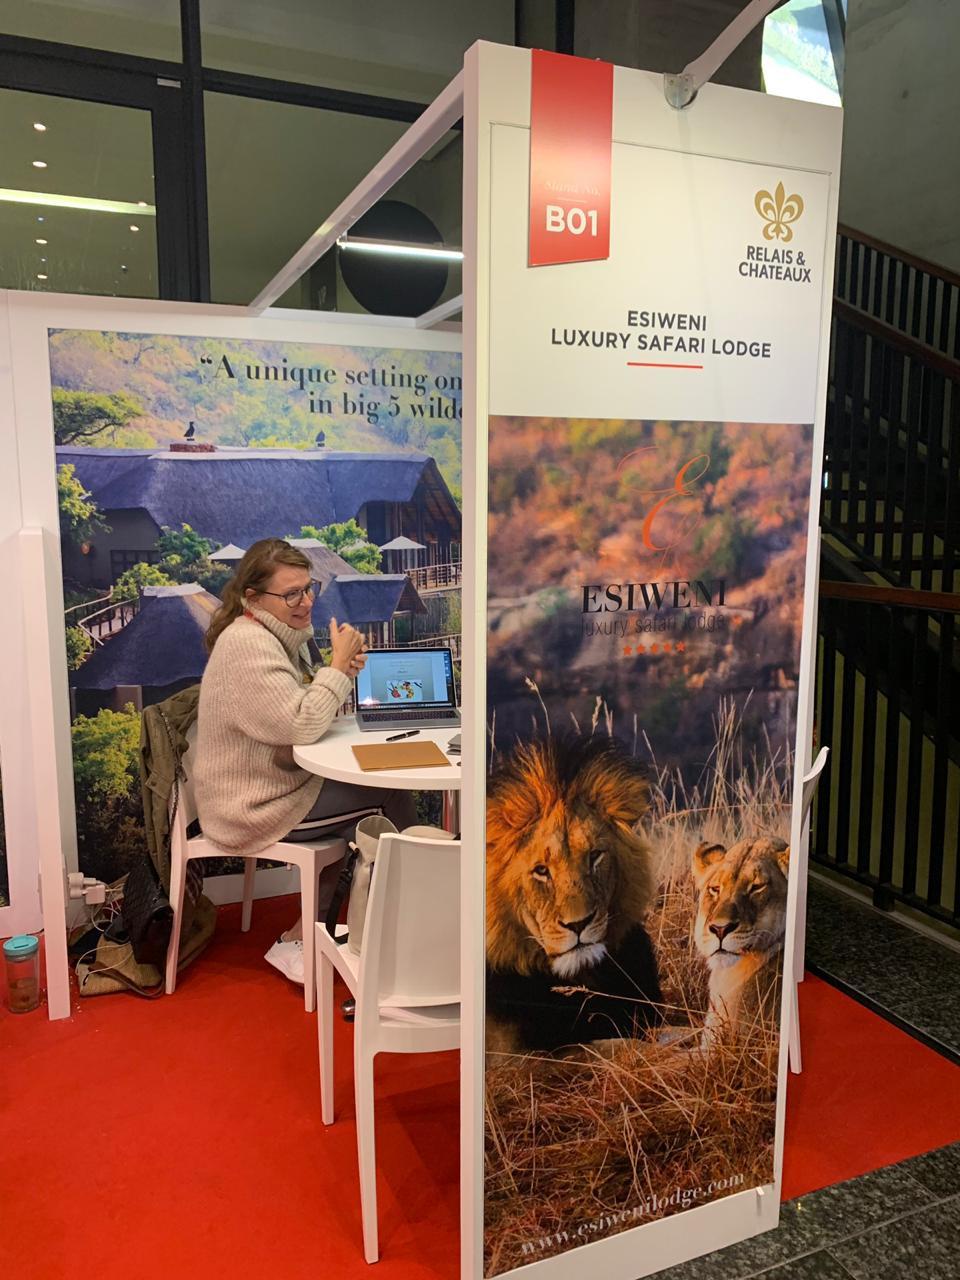 Esiweni Luxury Safari Lodge , Relais&Chateaux, We Are Africa 2019